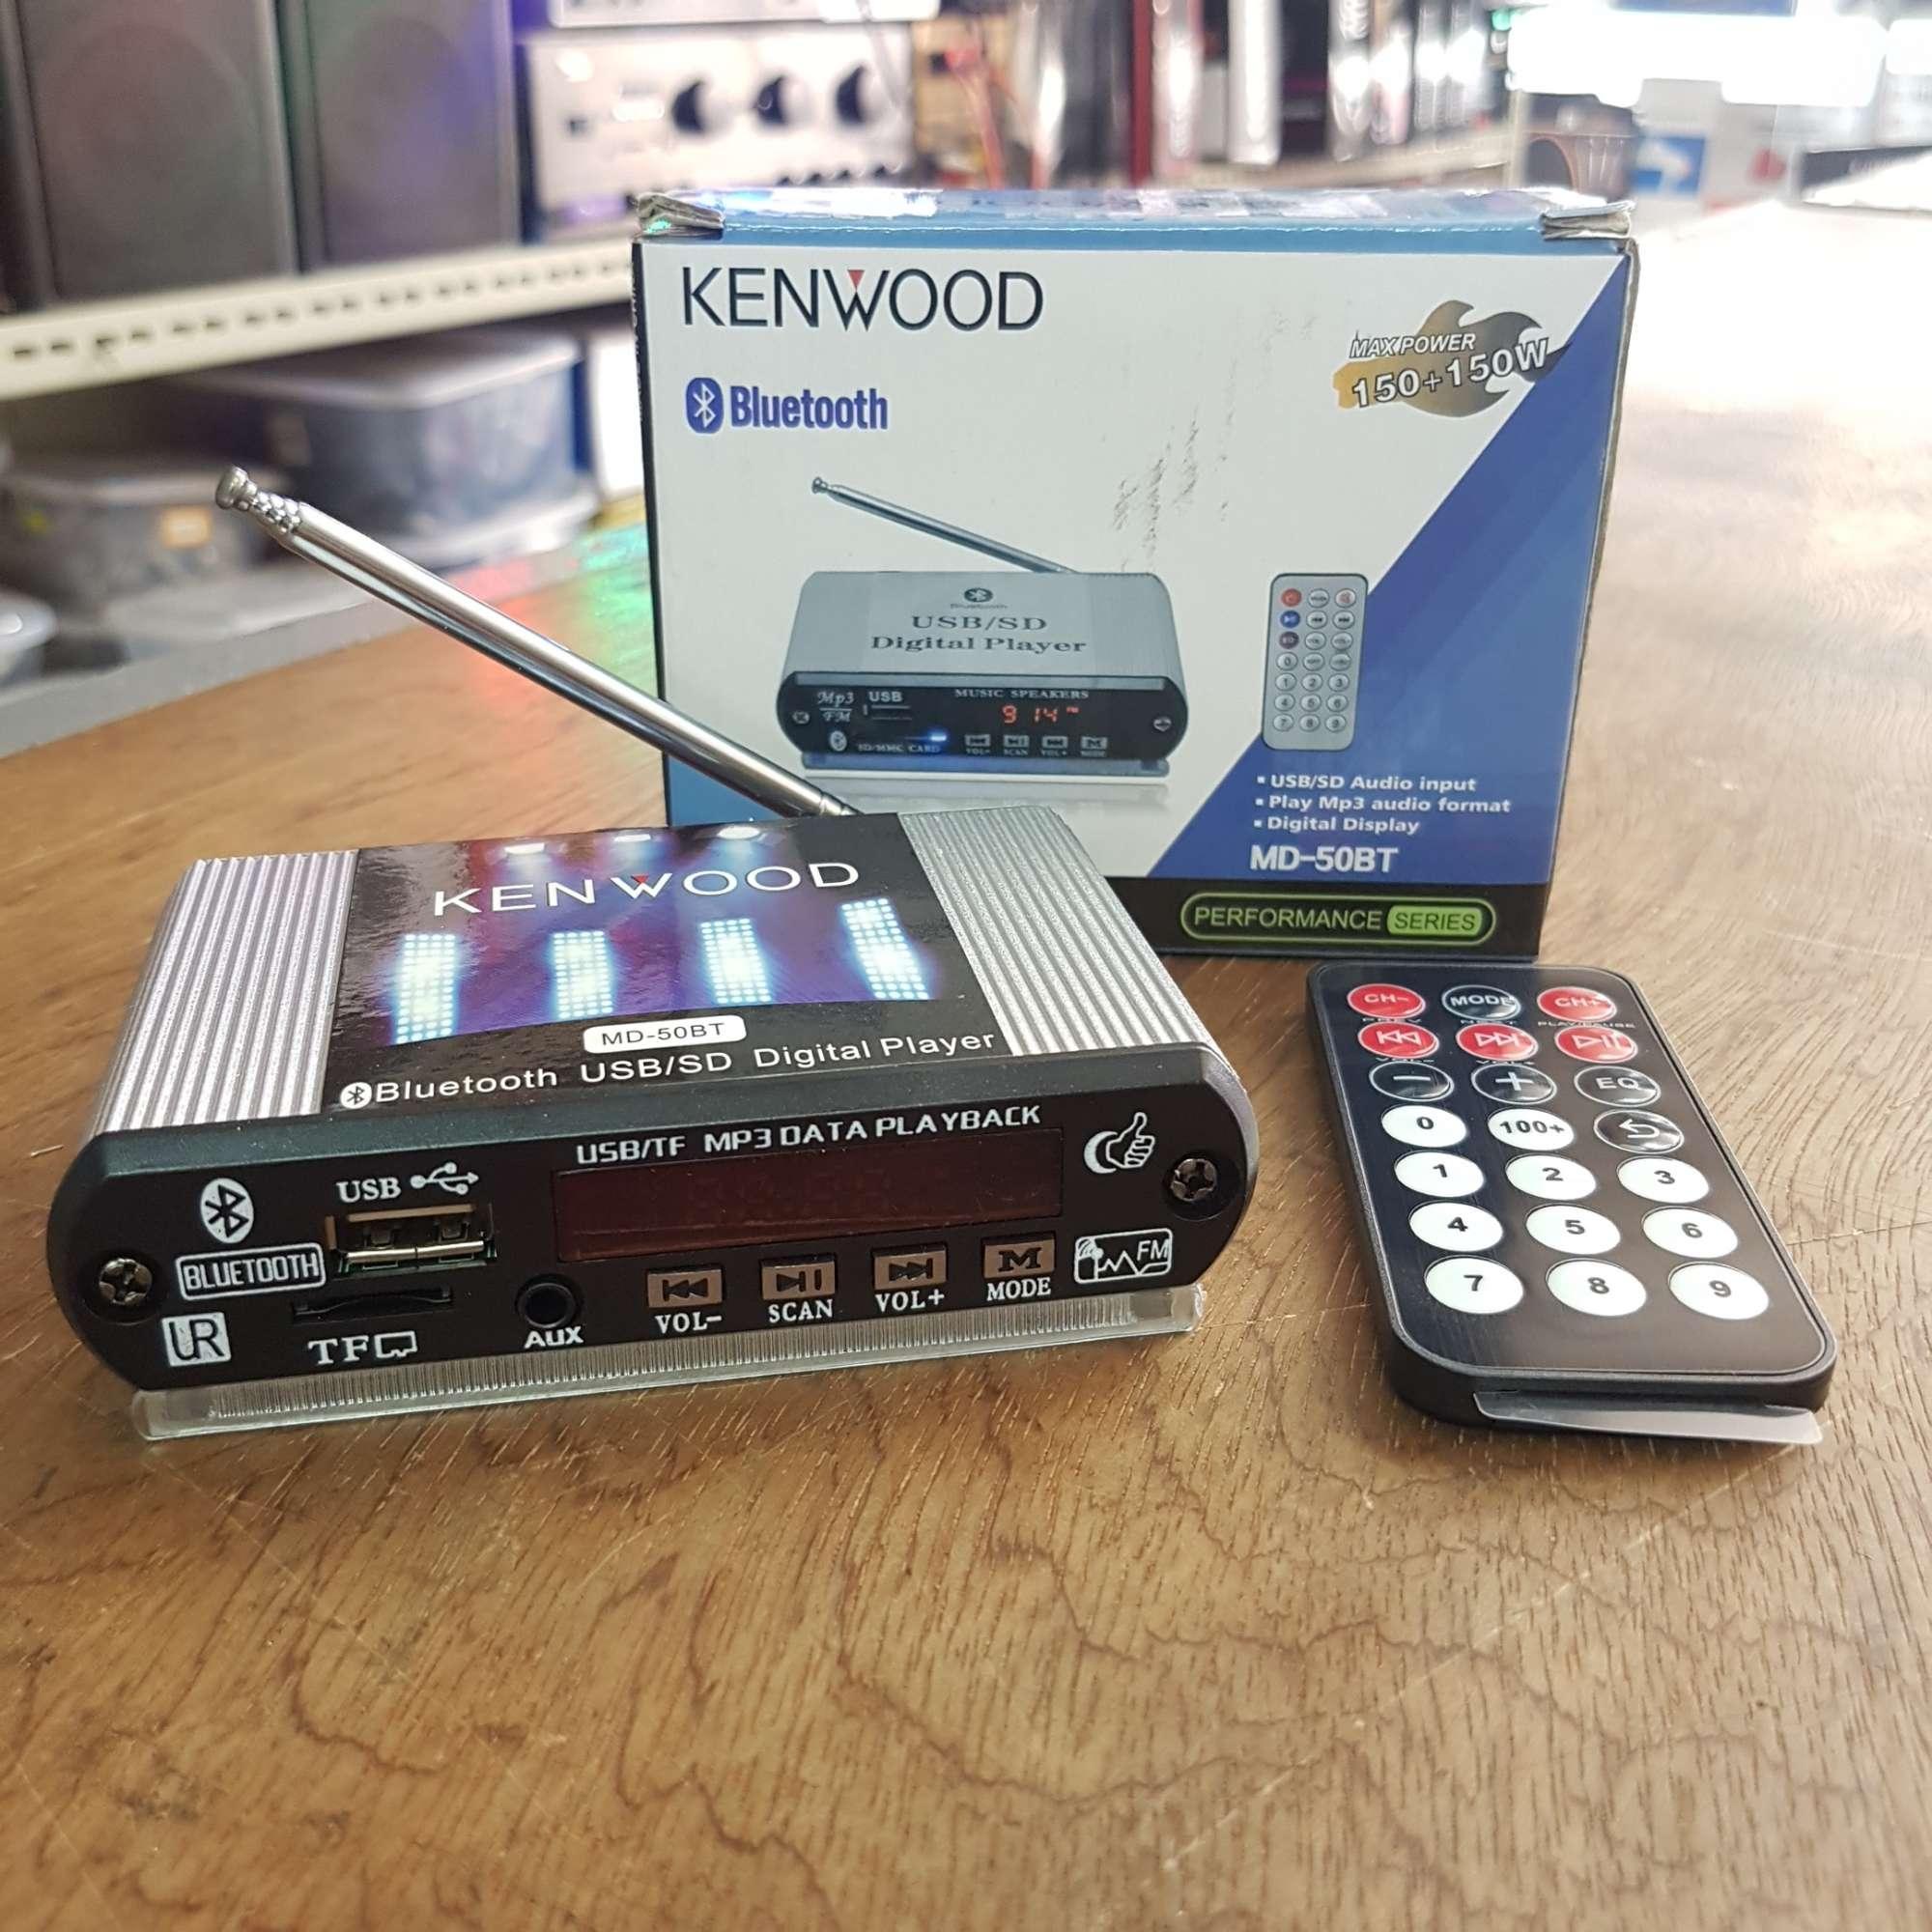 Car Audio For Sale Sound System Online Brands Prices Digital Media Receivers